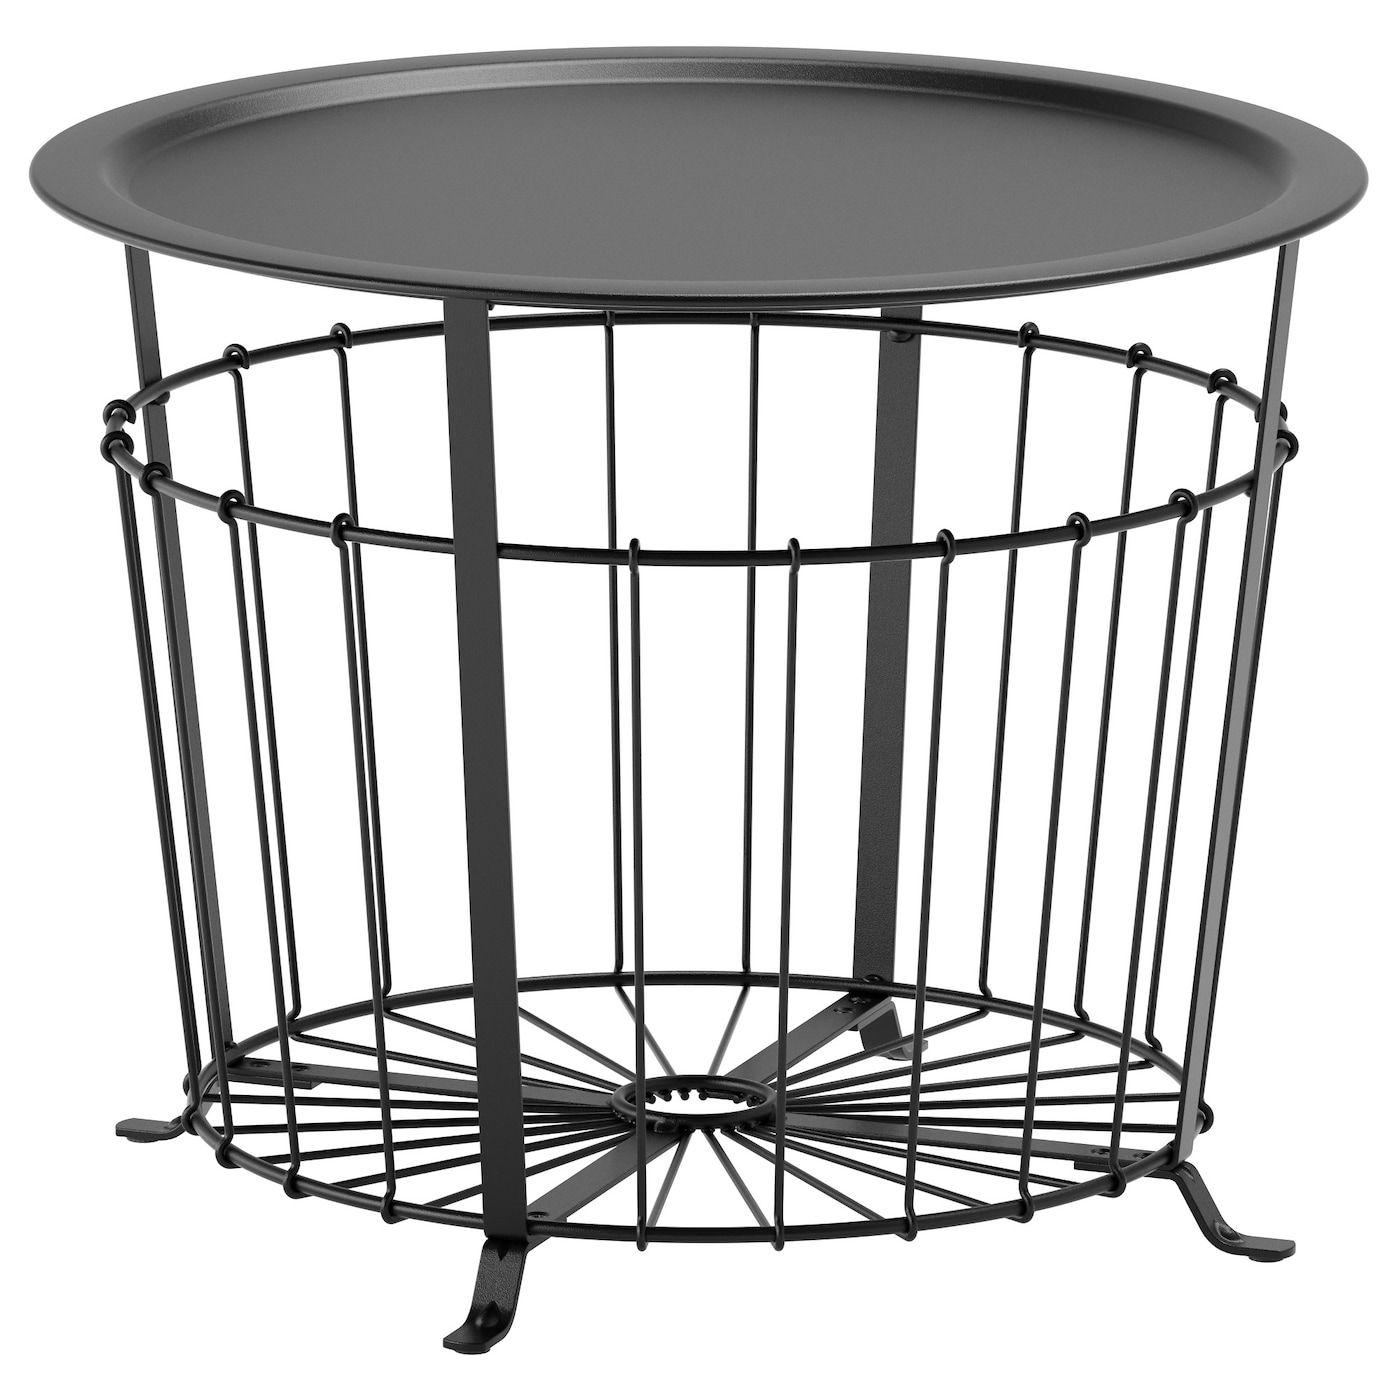 Gualov Storage Table Black 23 5 8 Table Storage Living Room Table Ikea [ 1400 x 1400 Pixel ]